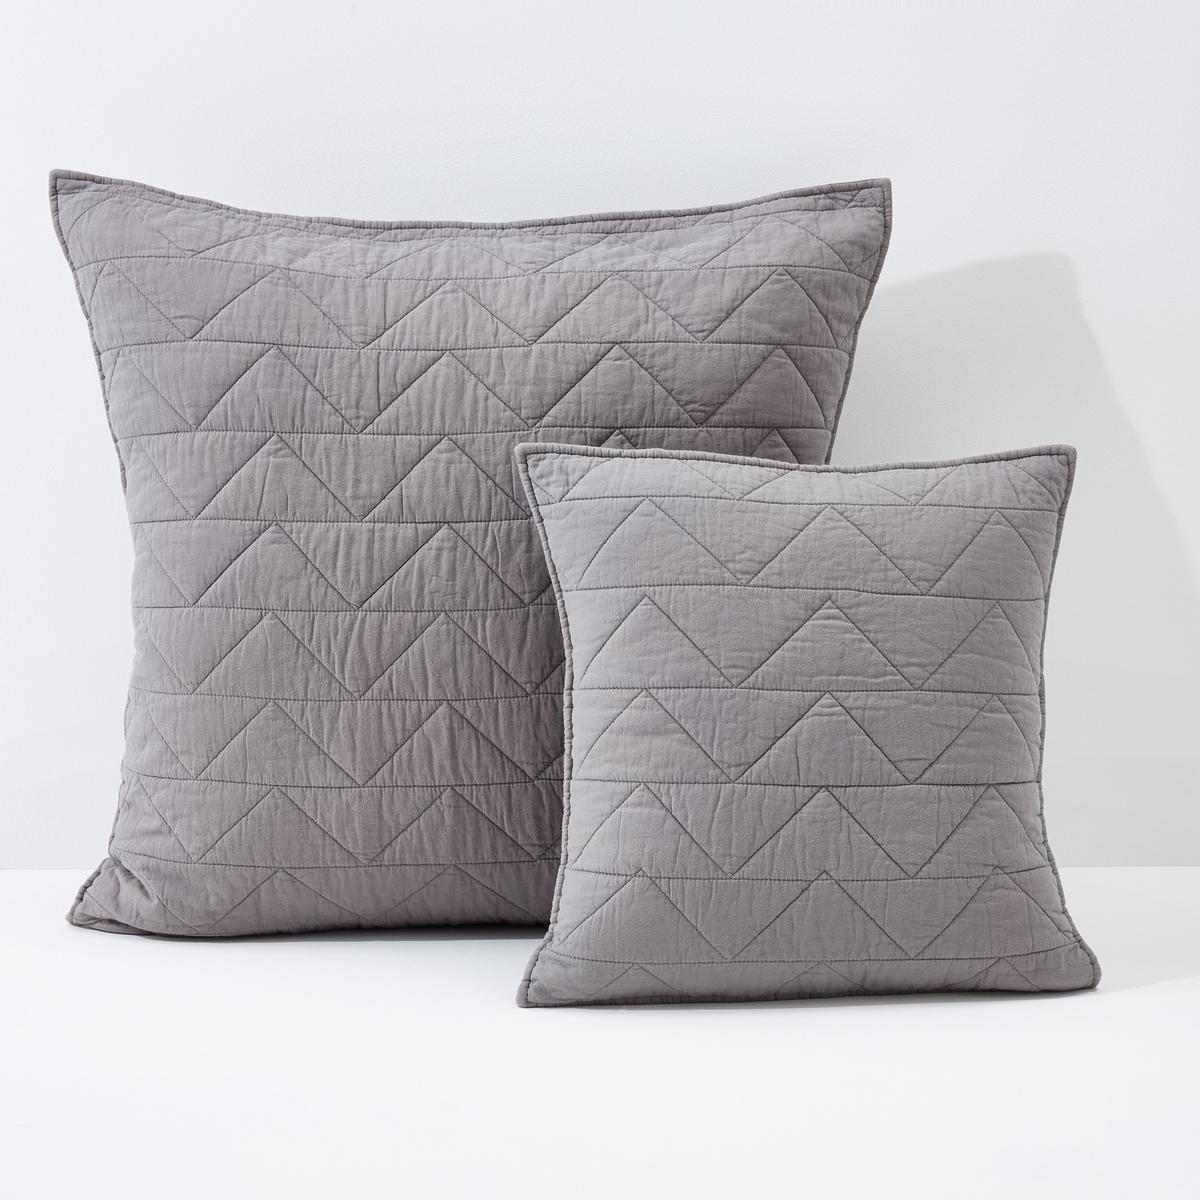 лучшая цена Чехол La Redoute На подушку наволочка Zig-zag 40 x 40 см серый